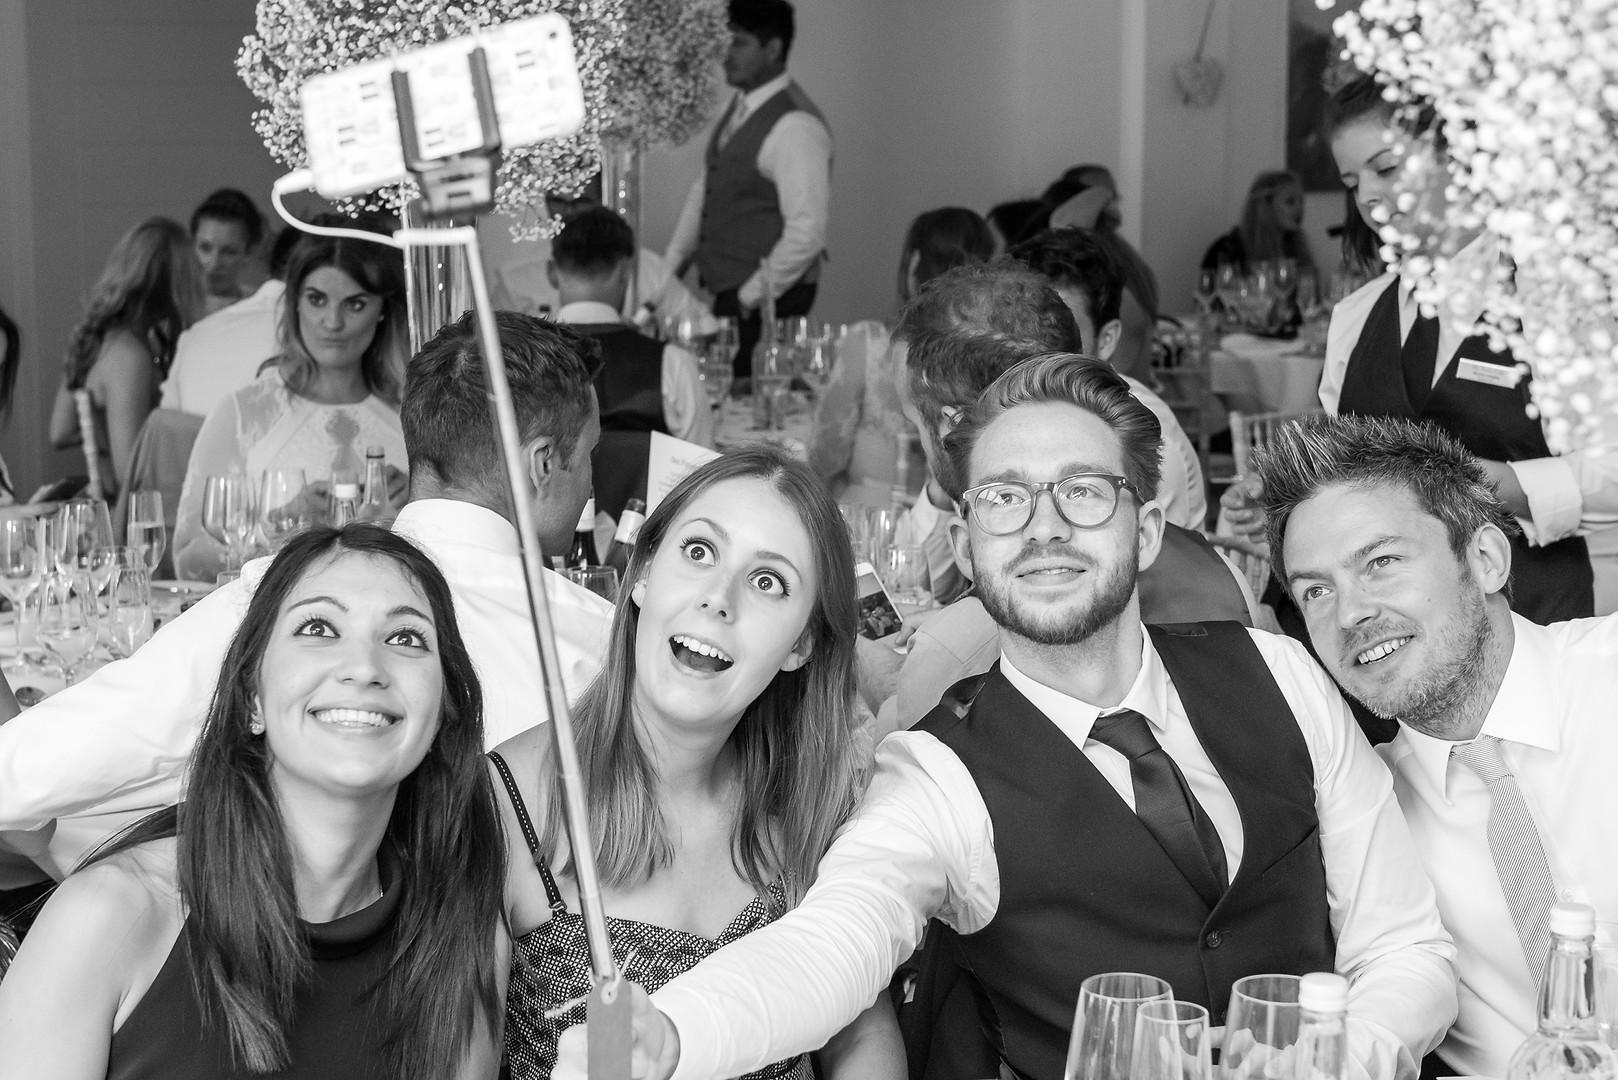 Selfie time at an Italian Villa wedding